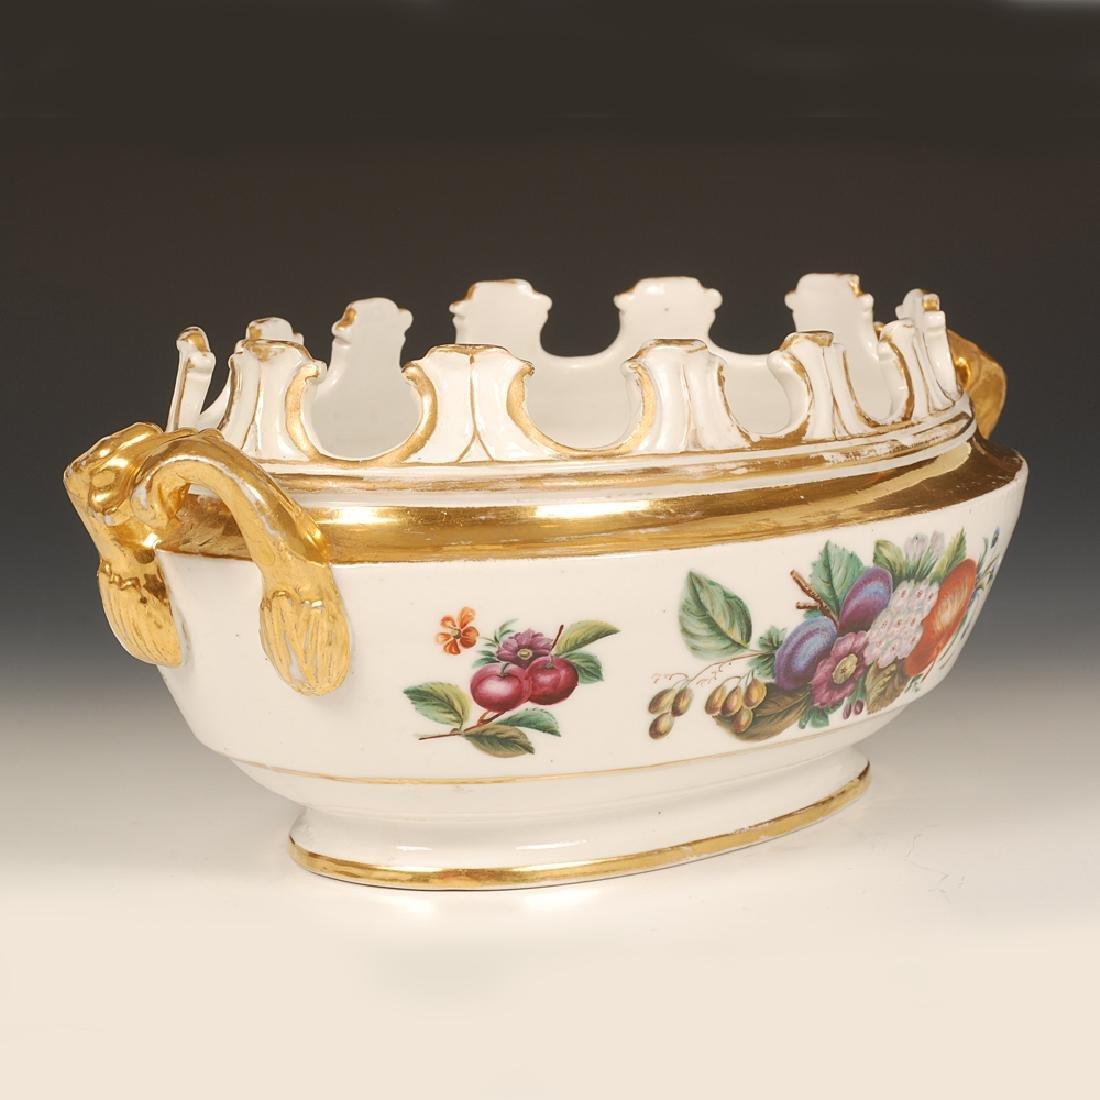 A rare Miklashevsky Factory porcelain wine glass cooler - 3